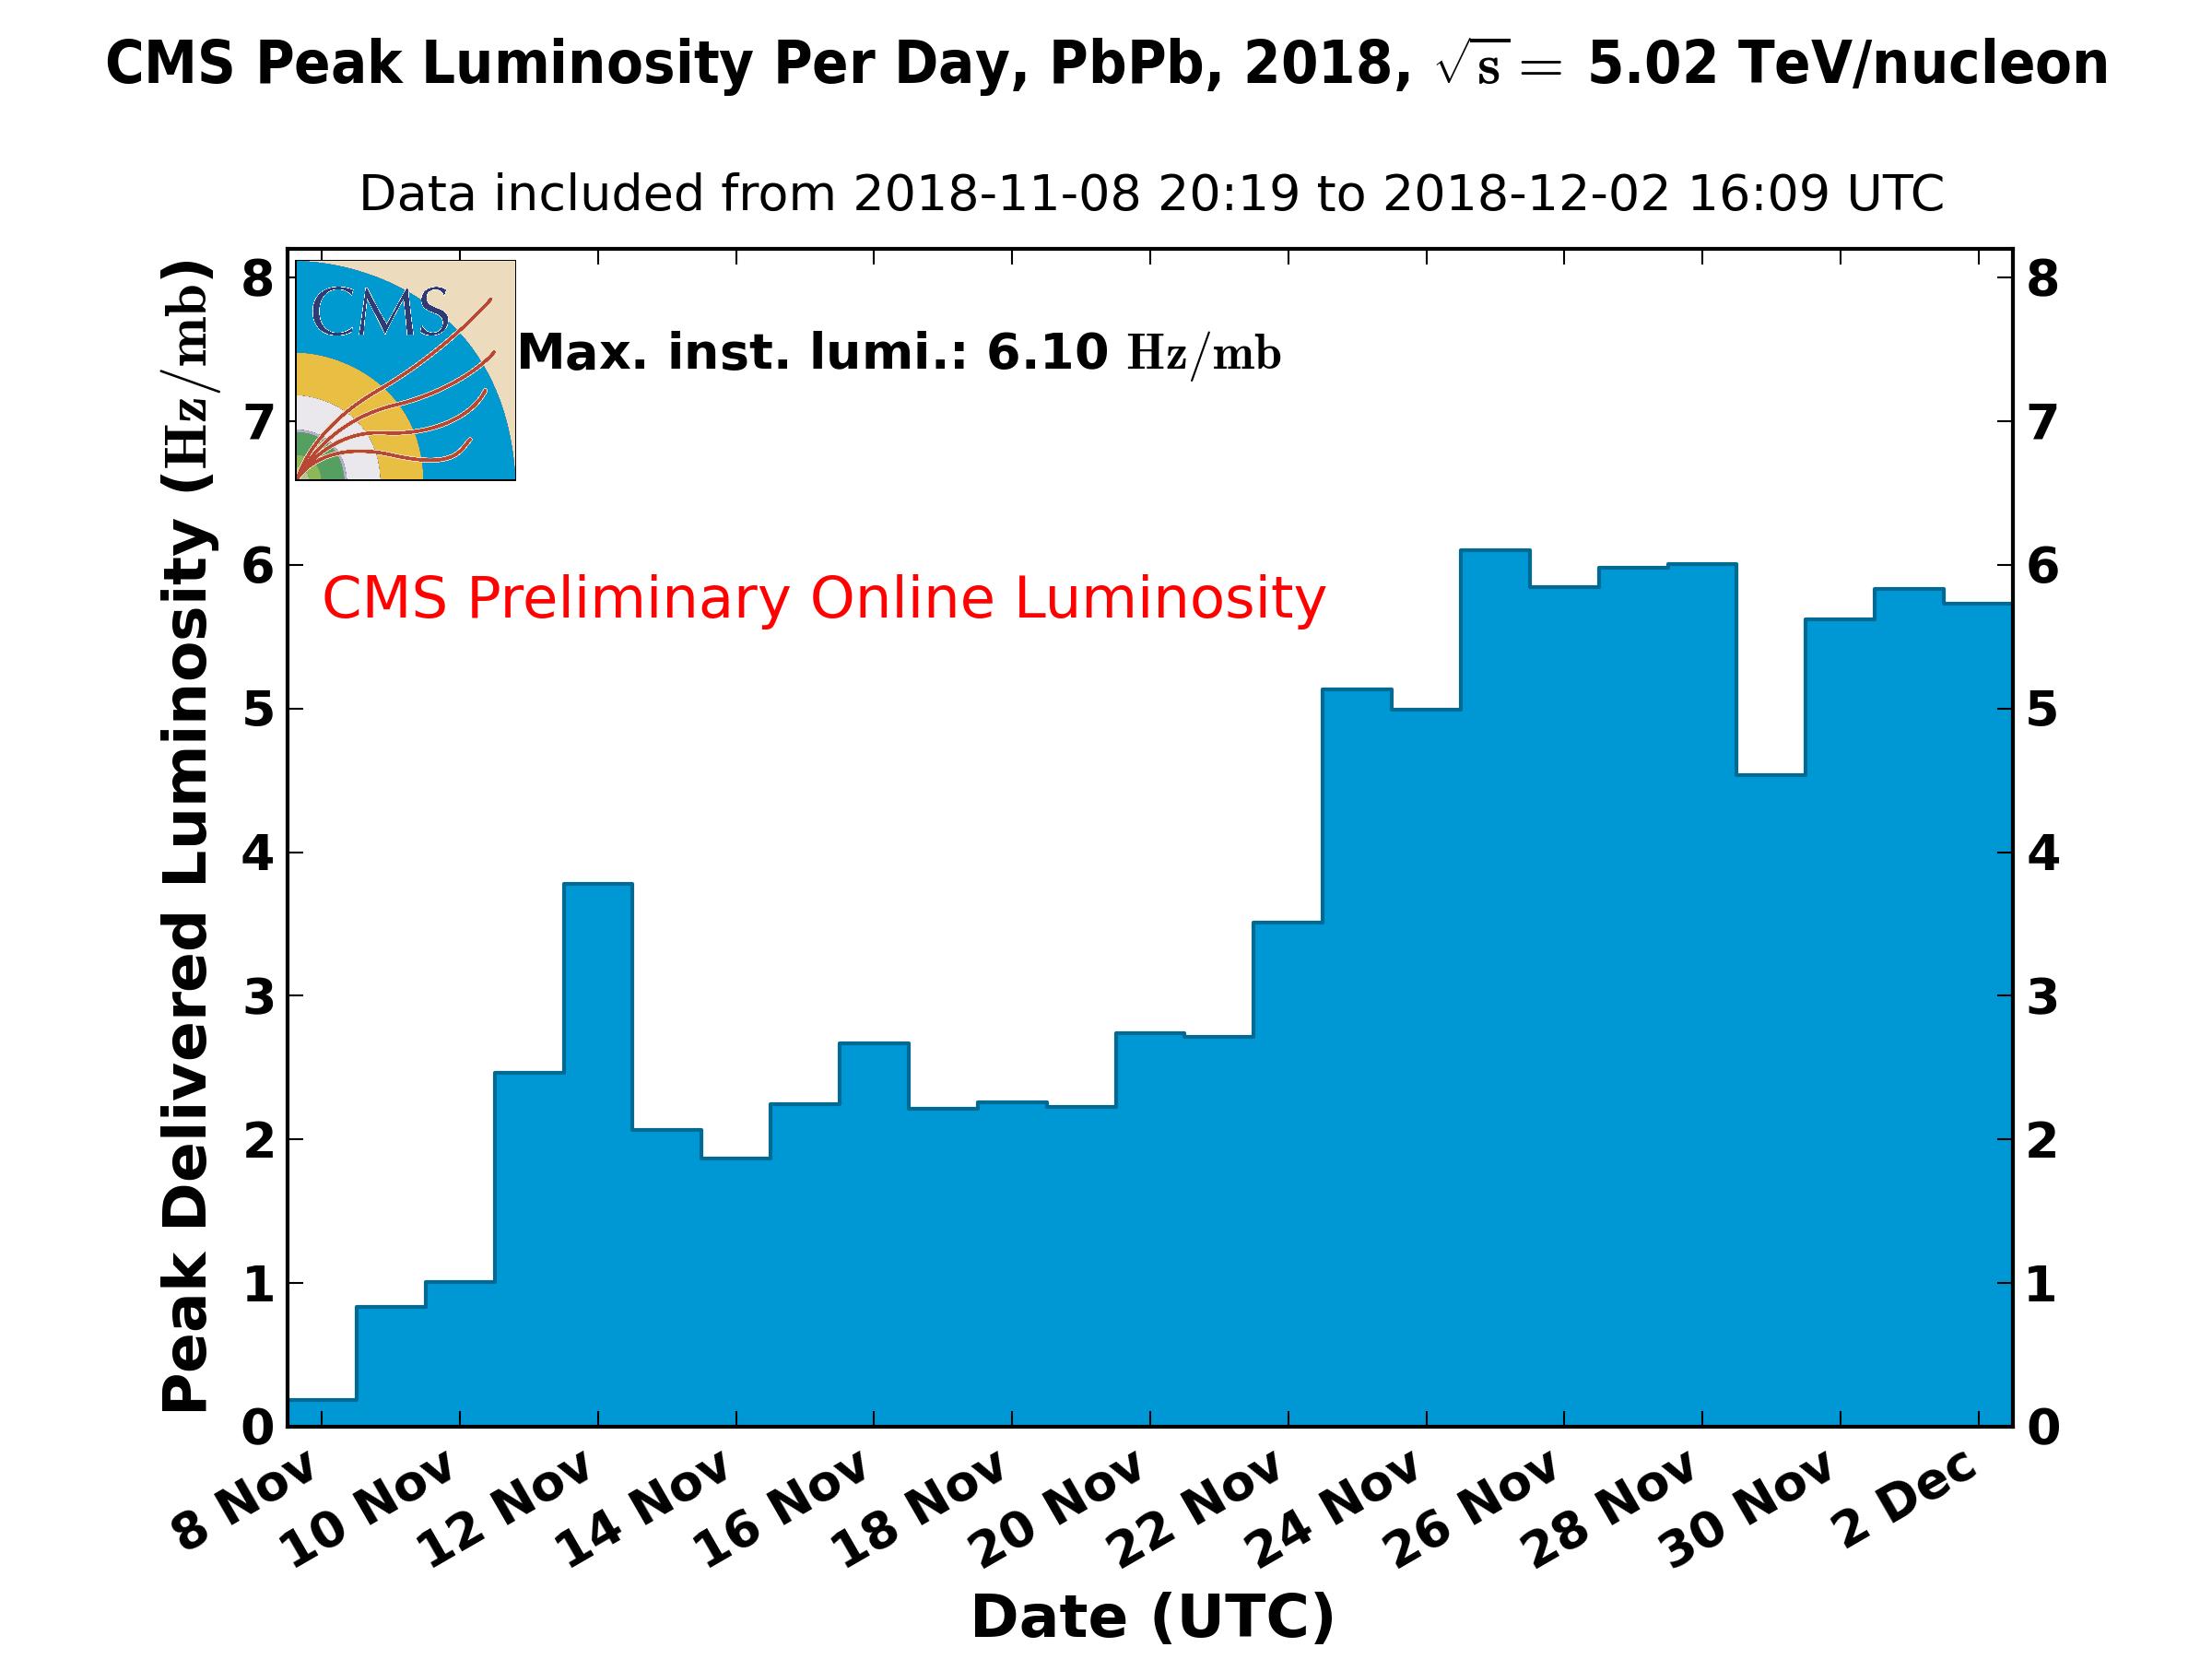 https://cern.ch/cmslumi/publicplots/peak_lumi_per_day_pbpb_2018OnlineLumi.png